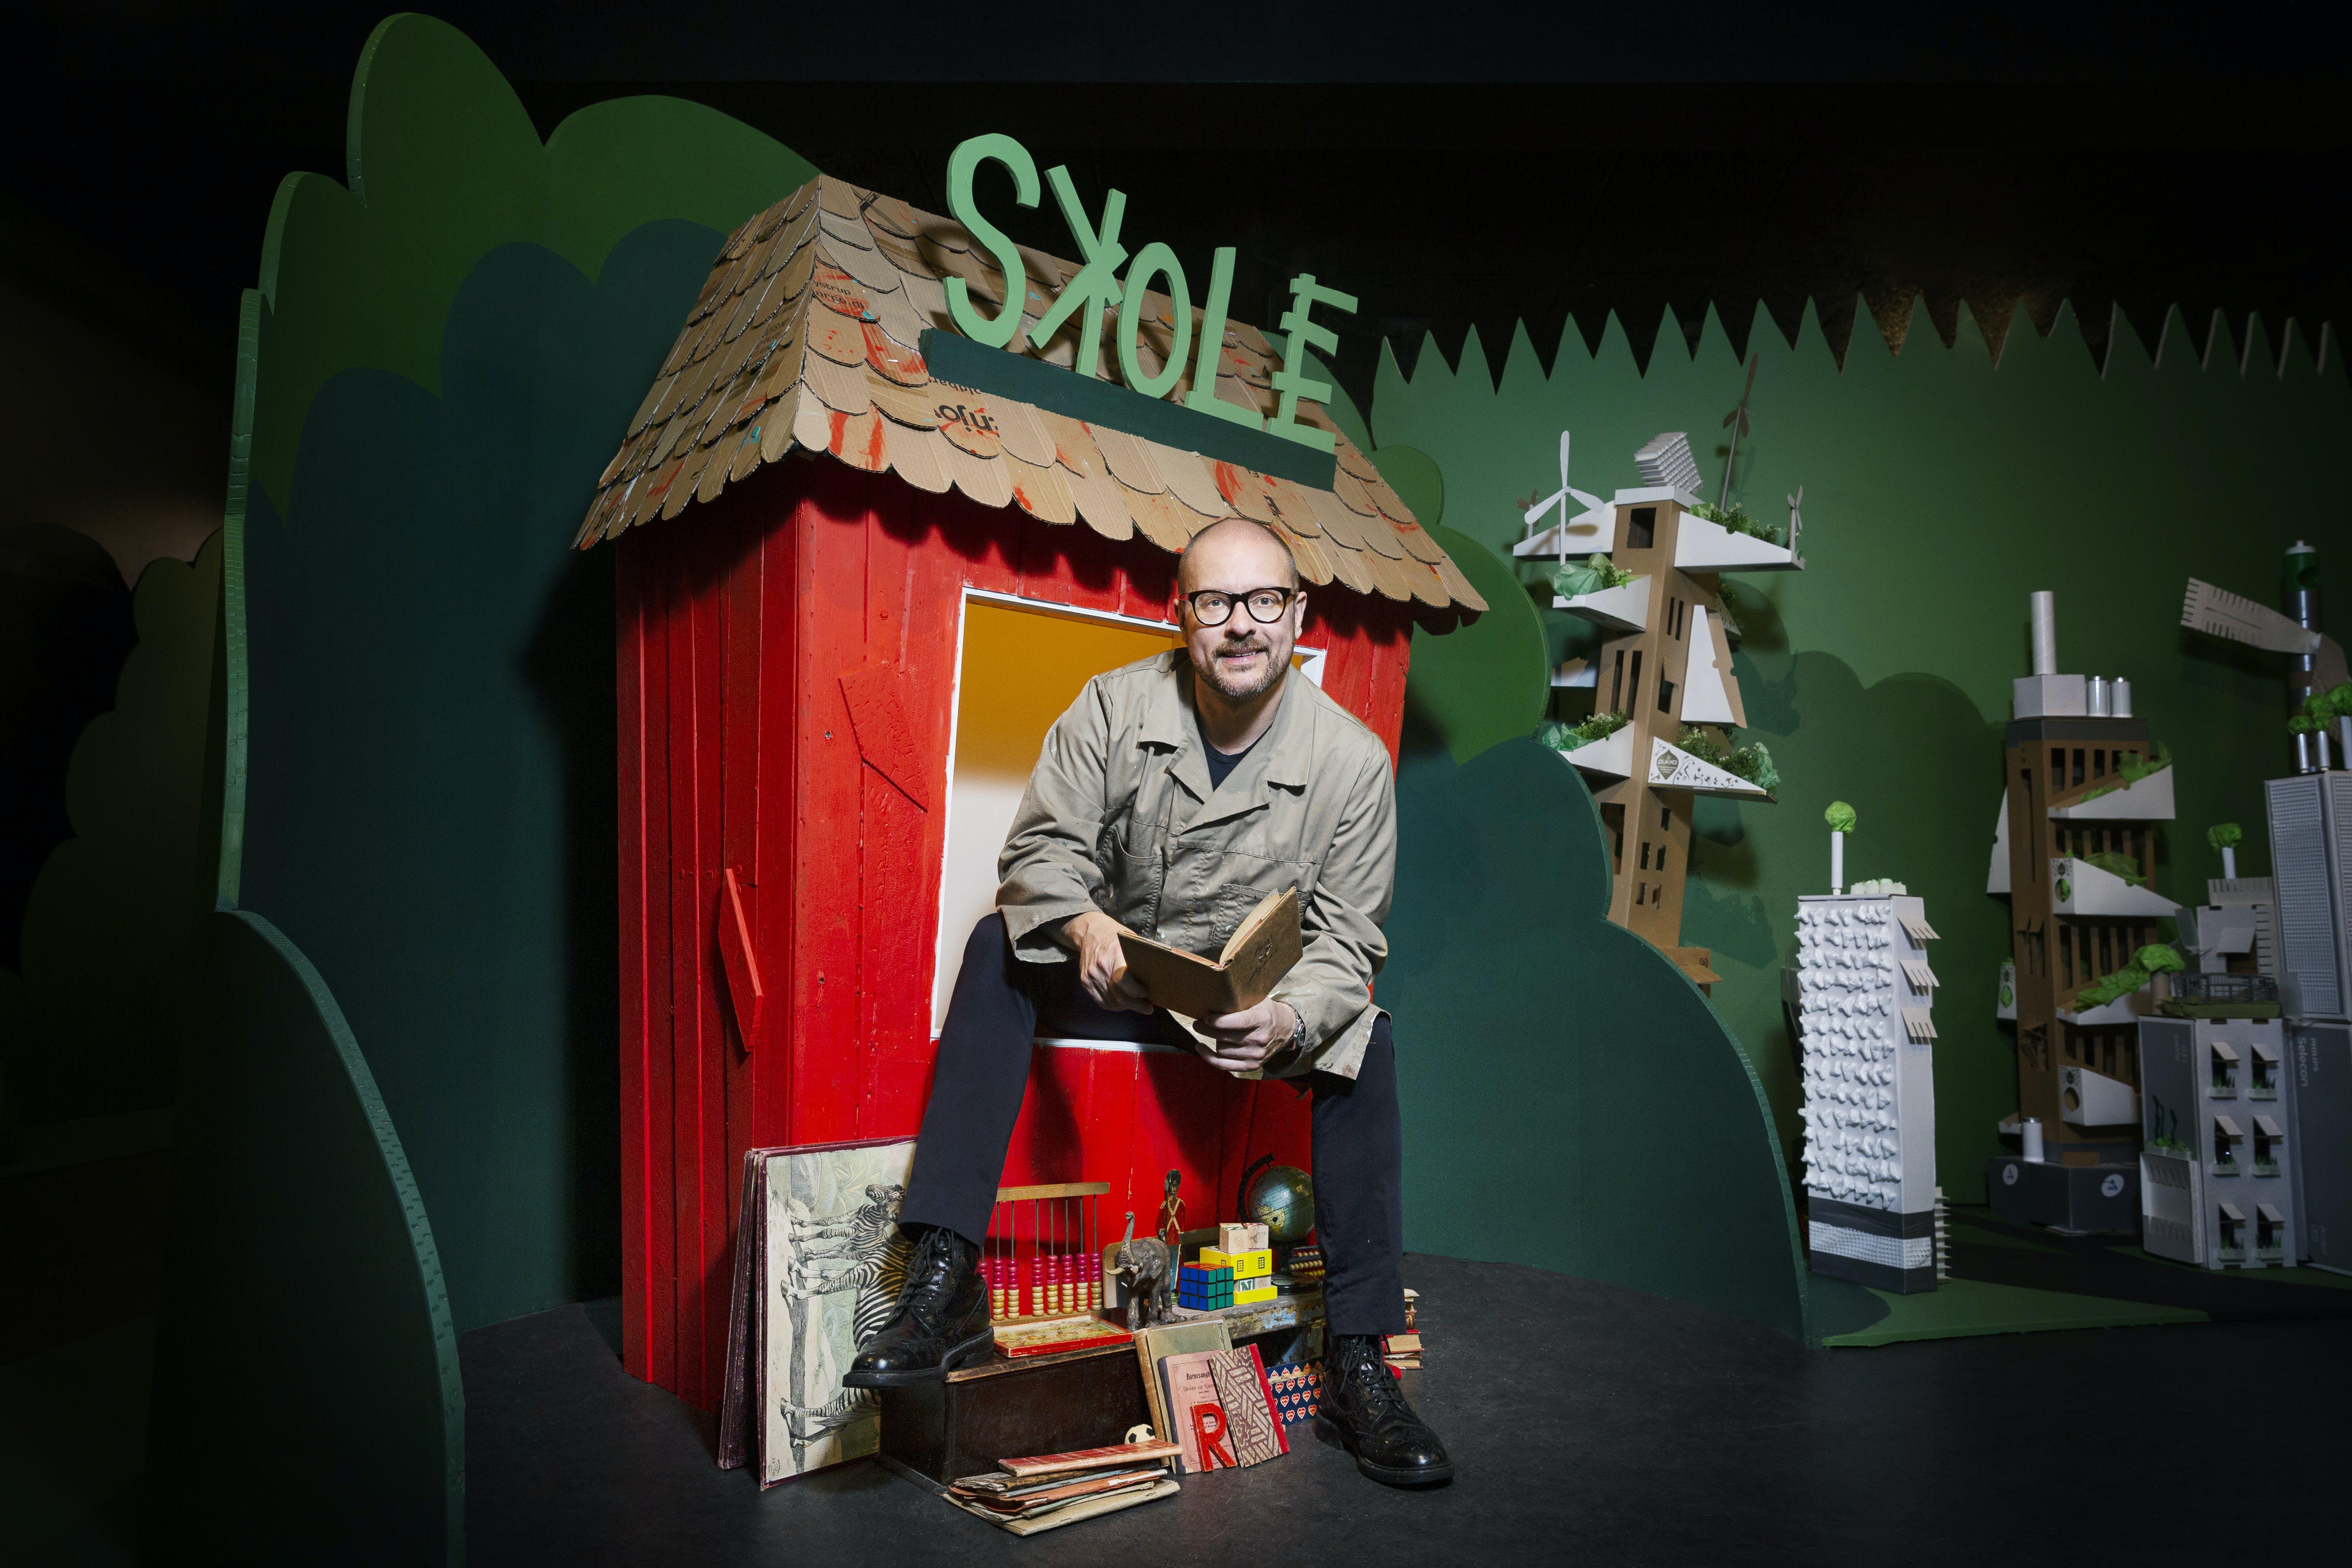 Multikunstner Shane Brox har sammen med Naturhistorisk Museum i Aarhus lavet en udstilling om Verdensmålene i børnehøjde. Foto: Naturhistorisk Museum Aarhus